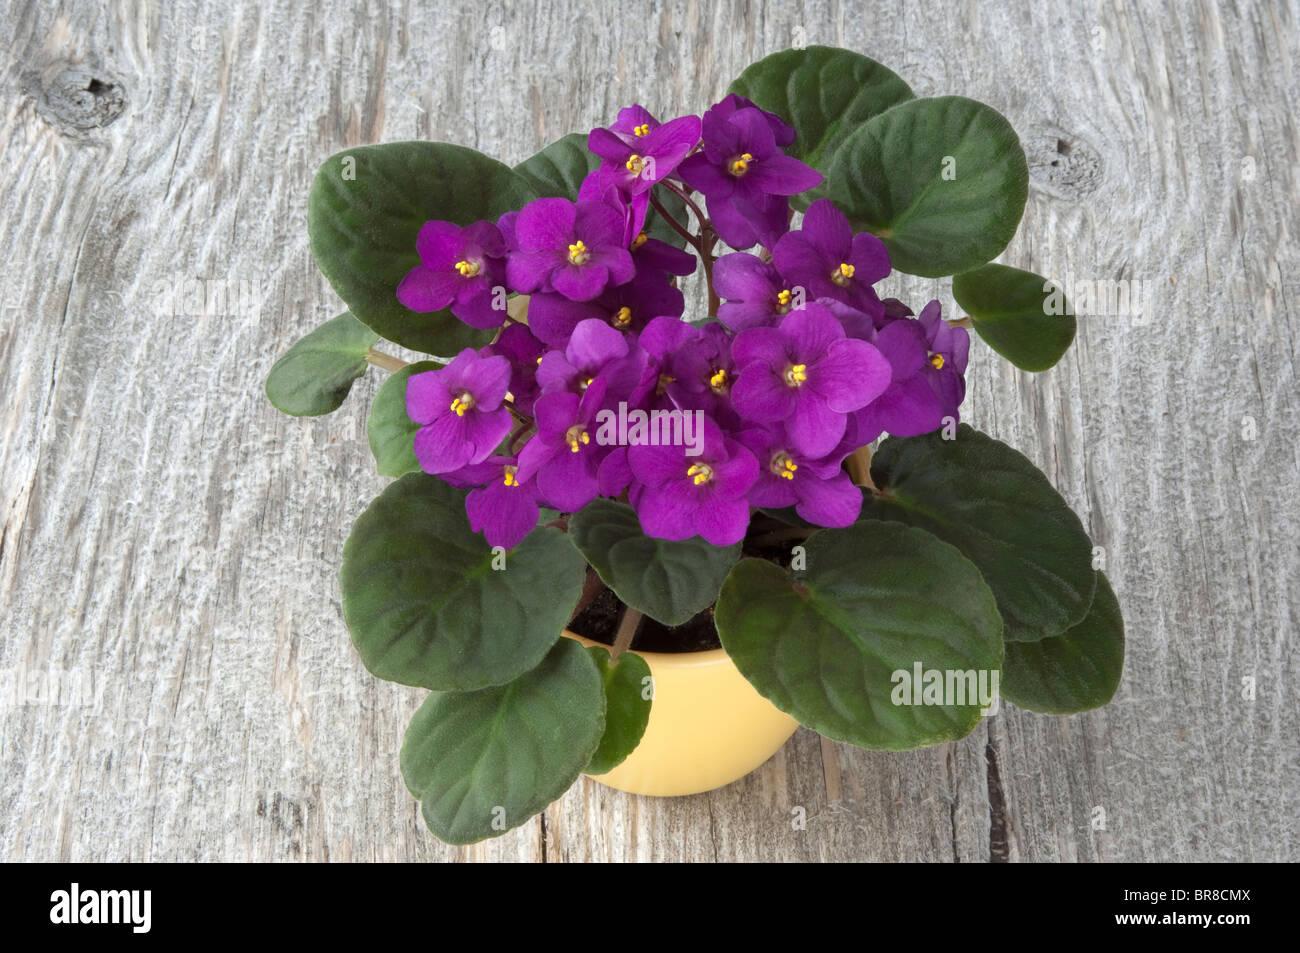 Saintpaulia, violeta Africana (Saintpaulia ionantha-híbrido), planta en maceta con flores púrpura sobre madera. Foto de stock